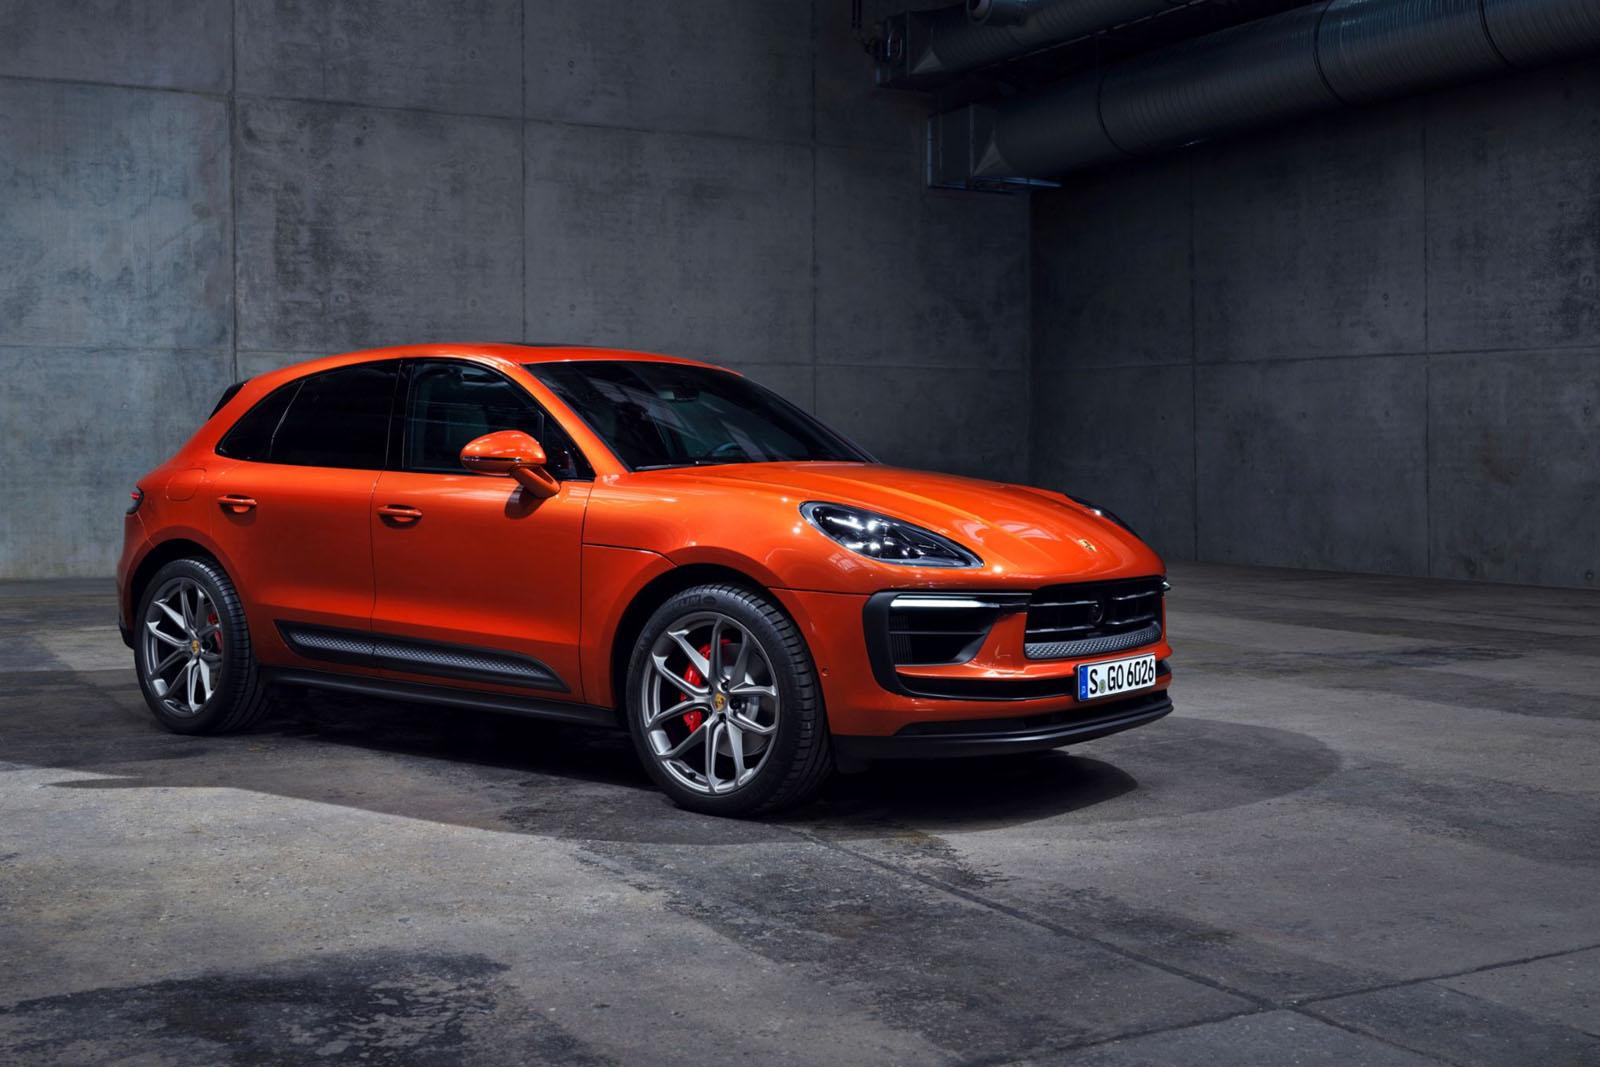 Porsche-Macan-2022-Front-Side